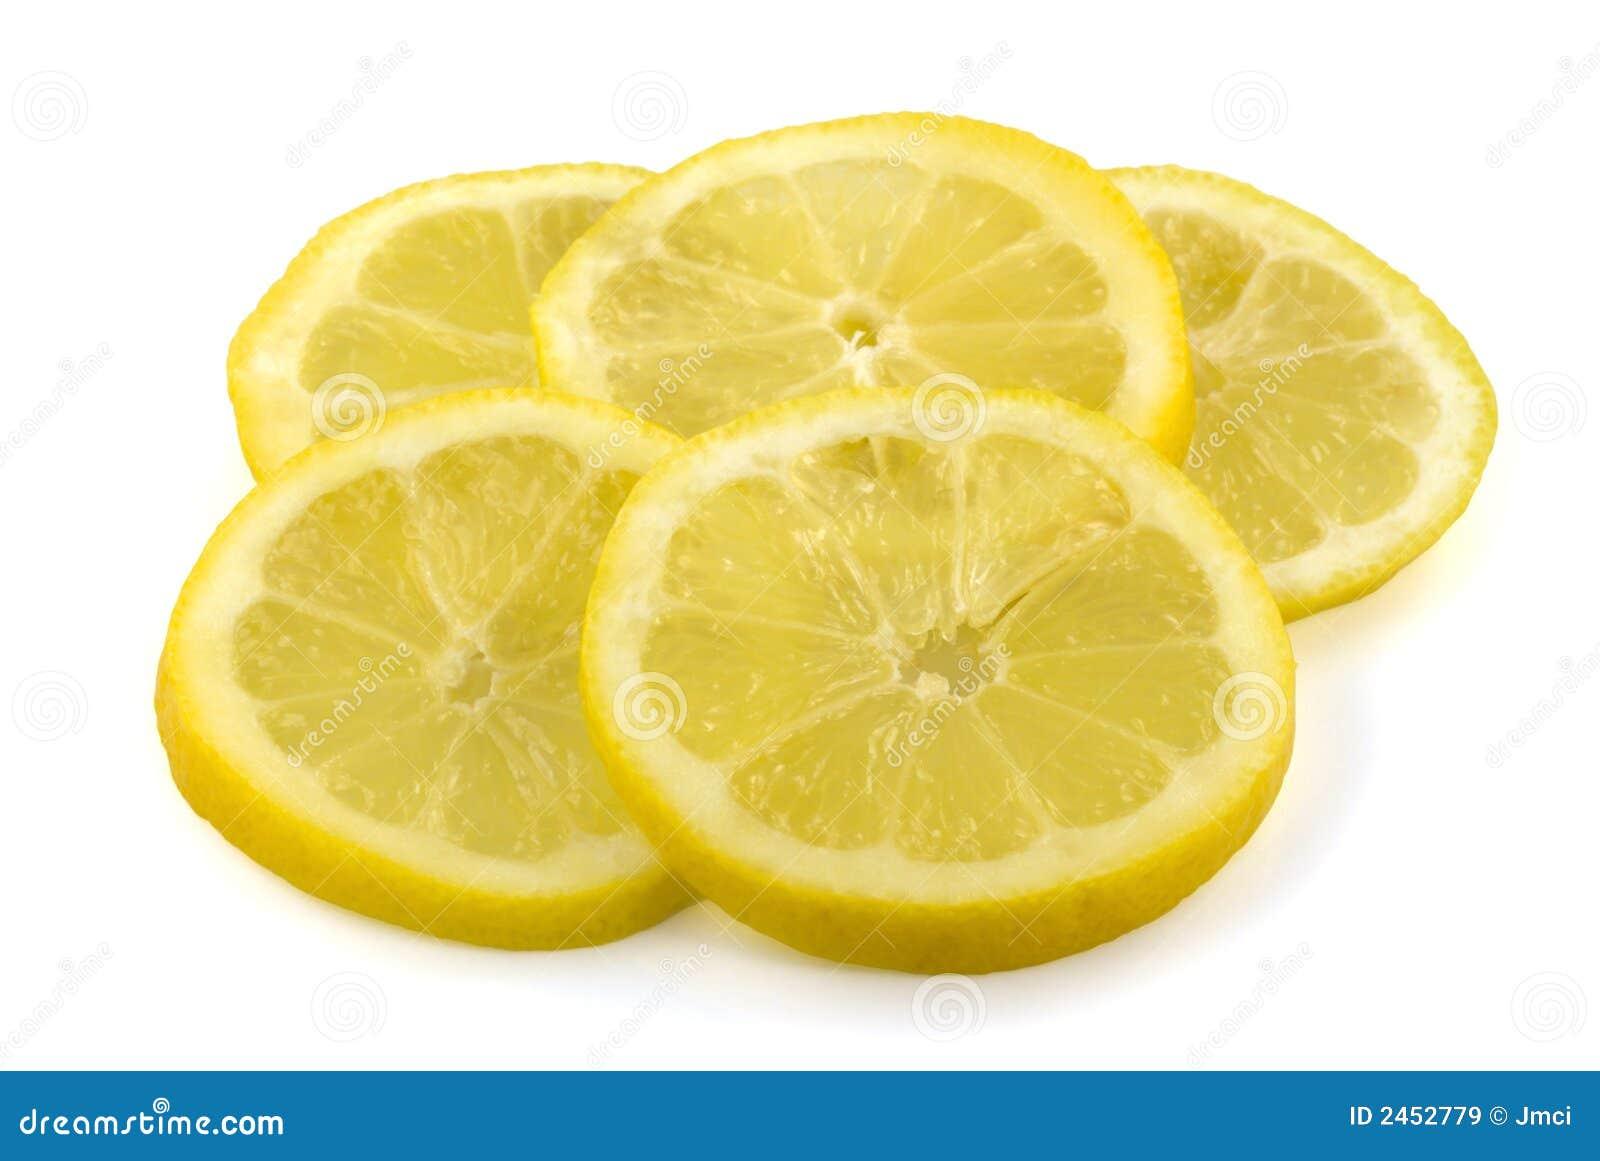 Slices Of Fresh Lemon Royalty Free Stock Images - Image: 2452779